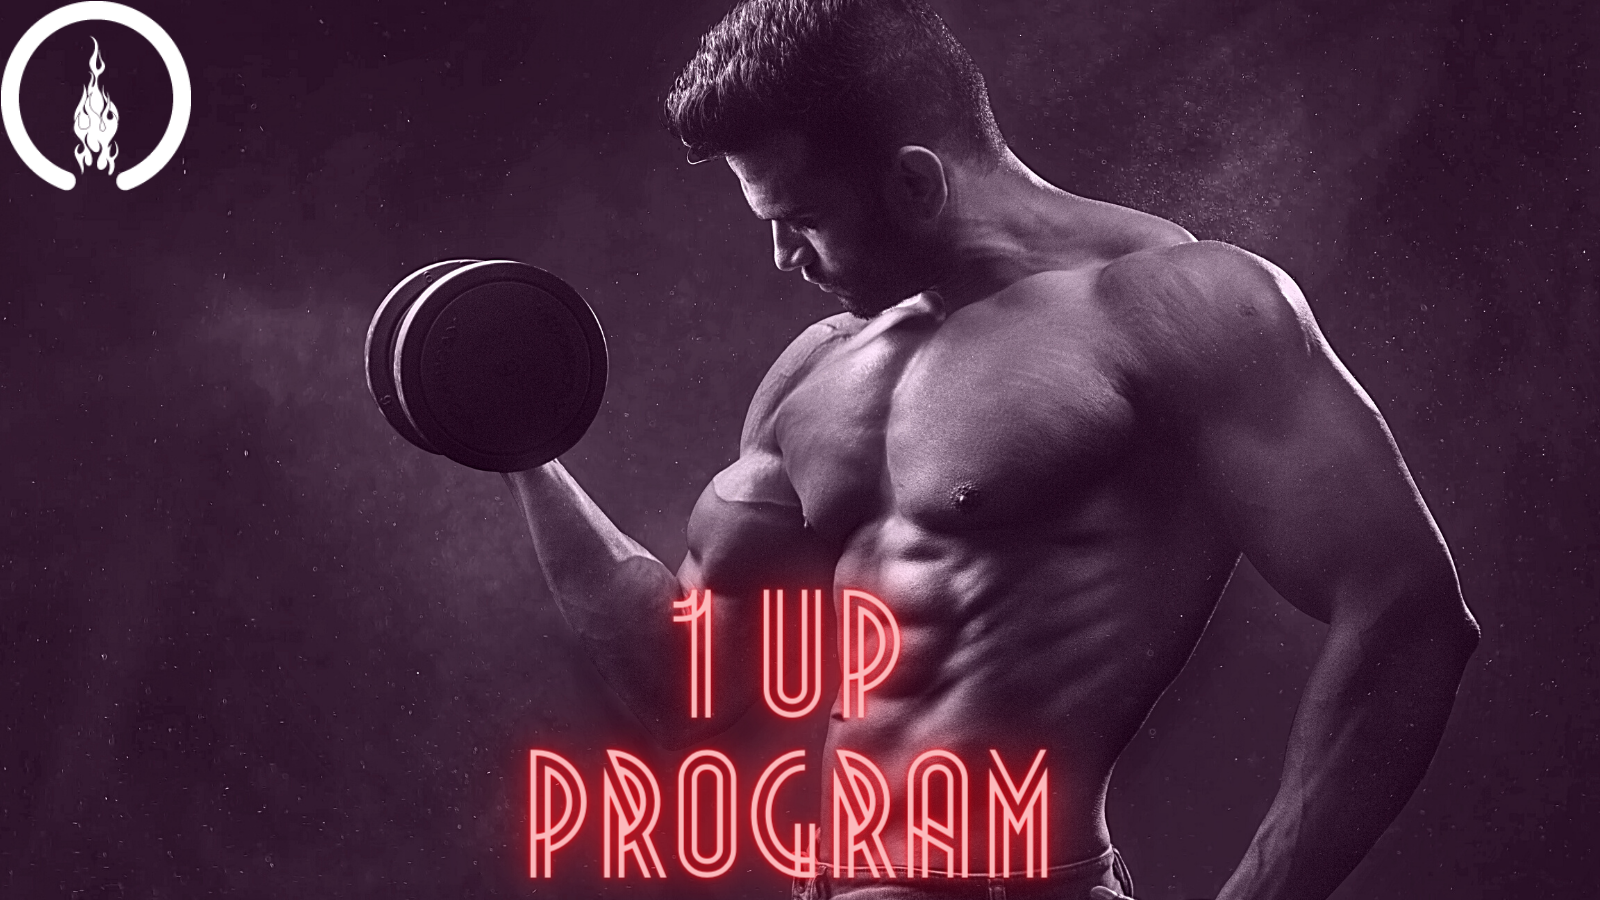 1 Up Program